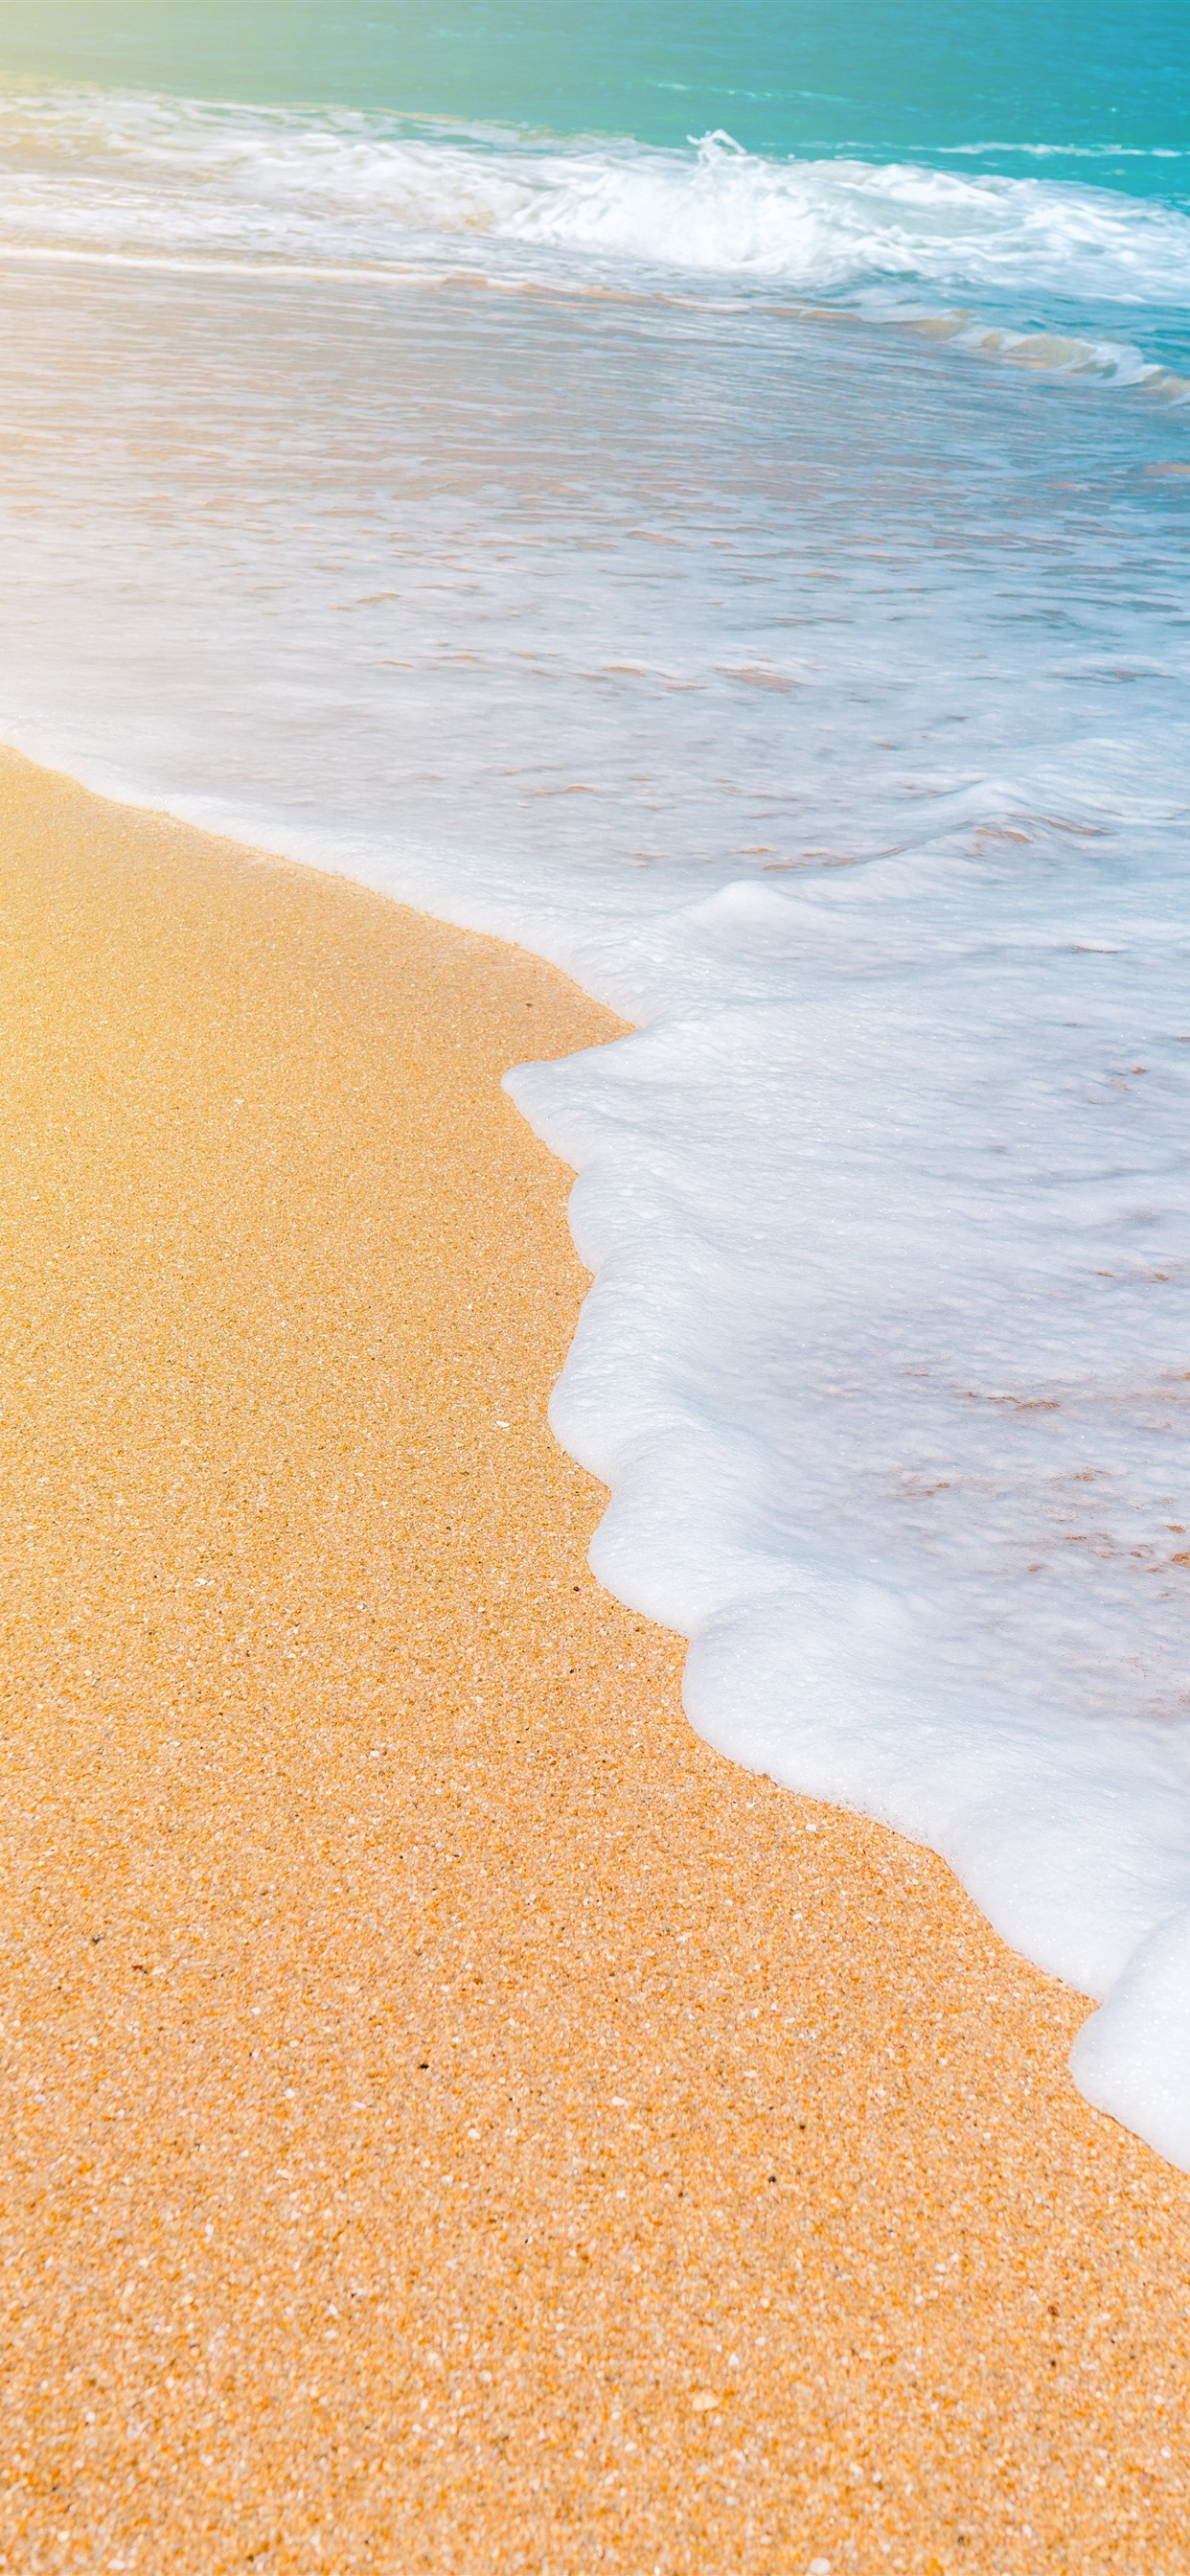 iphone xs wallpaper 4k beach